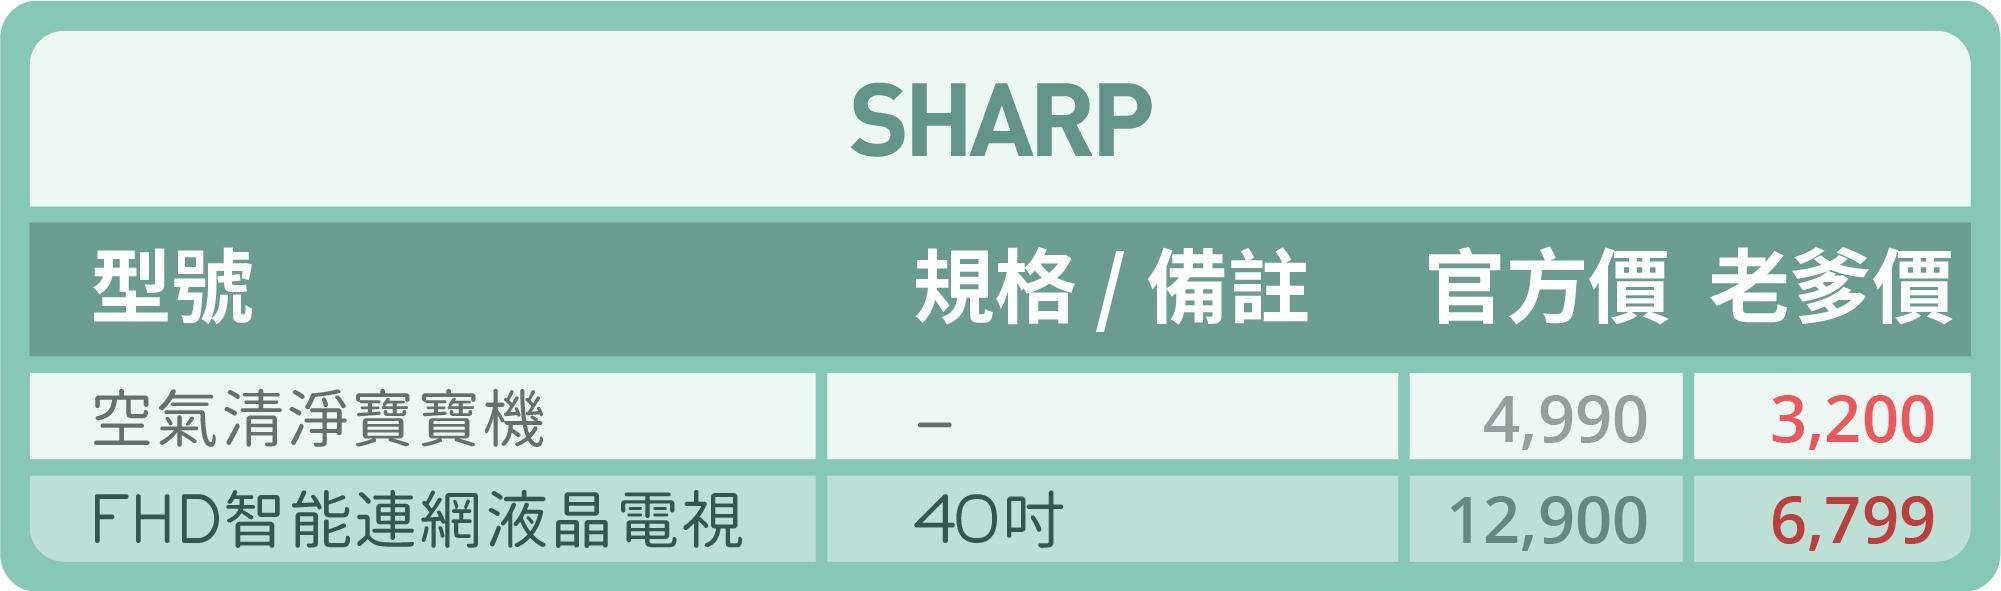 sharp家電系列-台中買手機